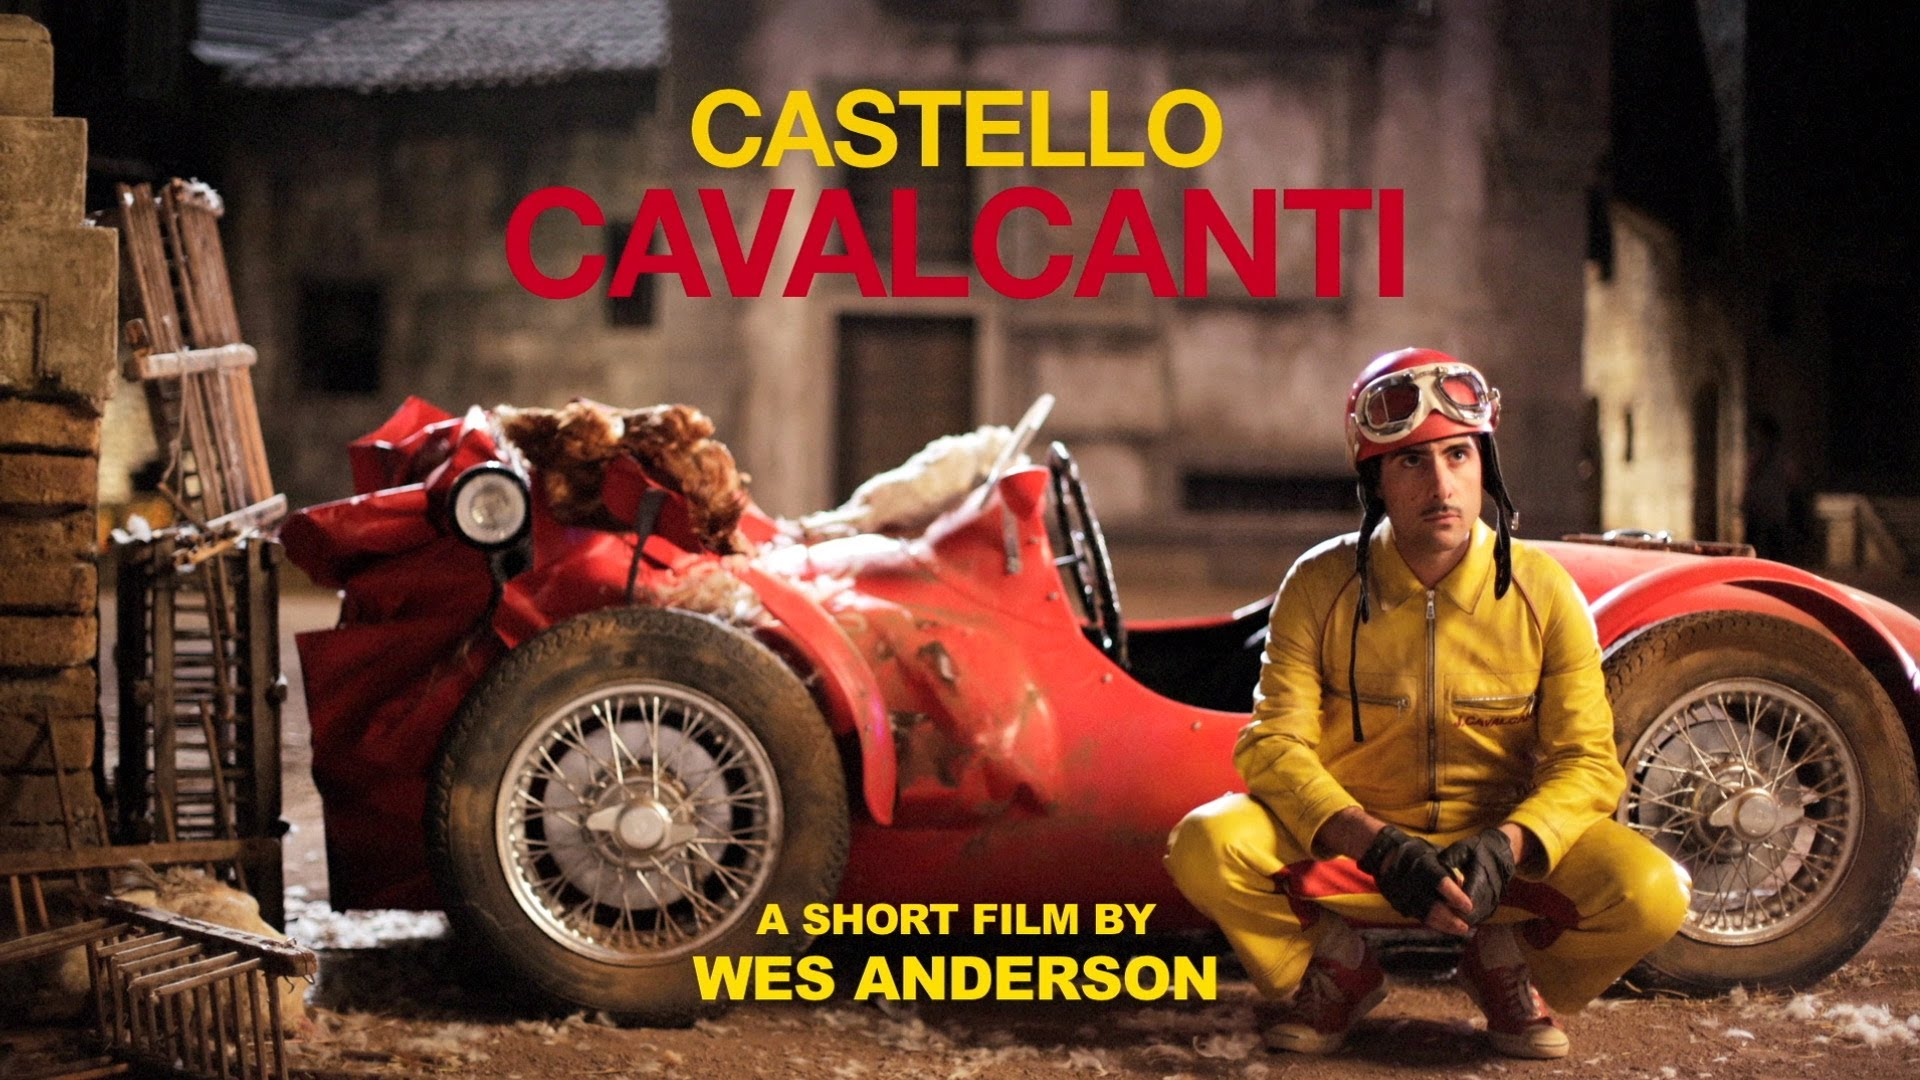 Prada Collaborates with Wes Anderson for Short Film 'Castello Cavalcanti'